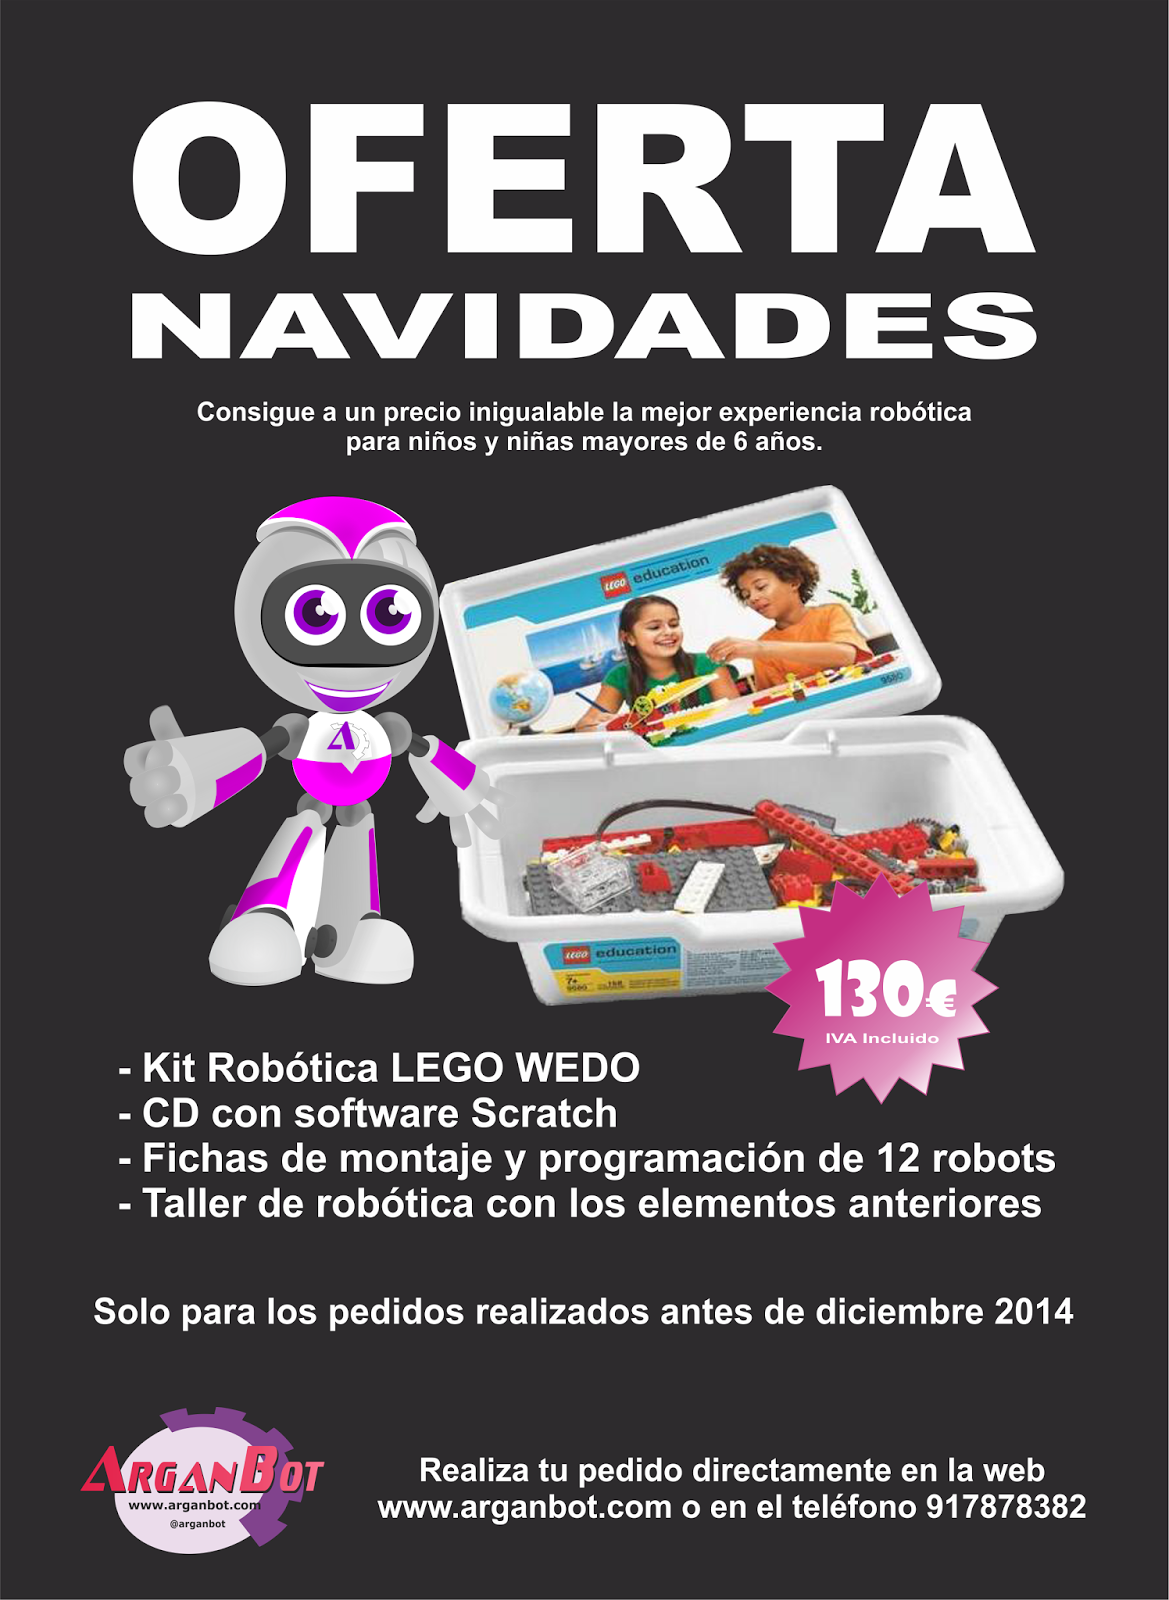 Pack Lego Wedo Oferta Navidad 2014